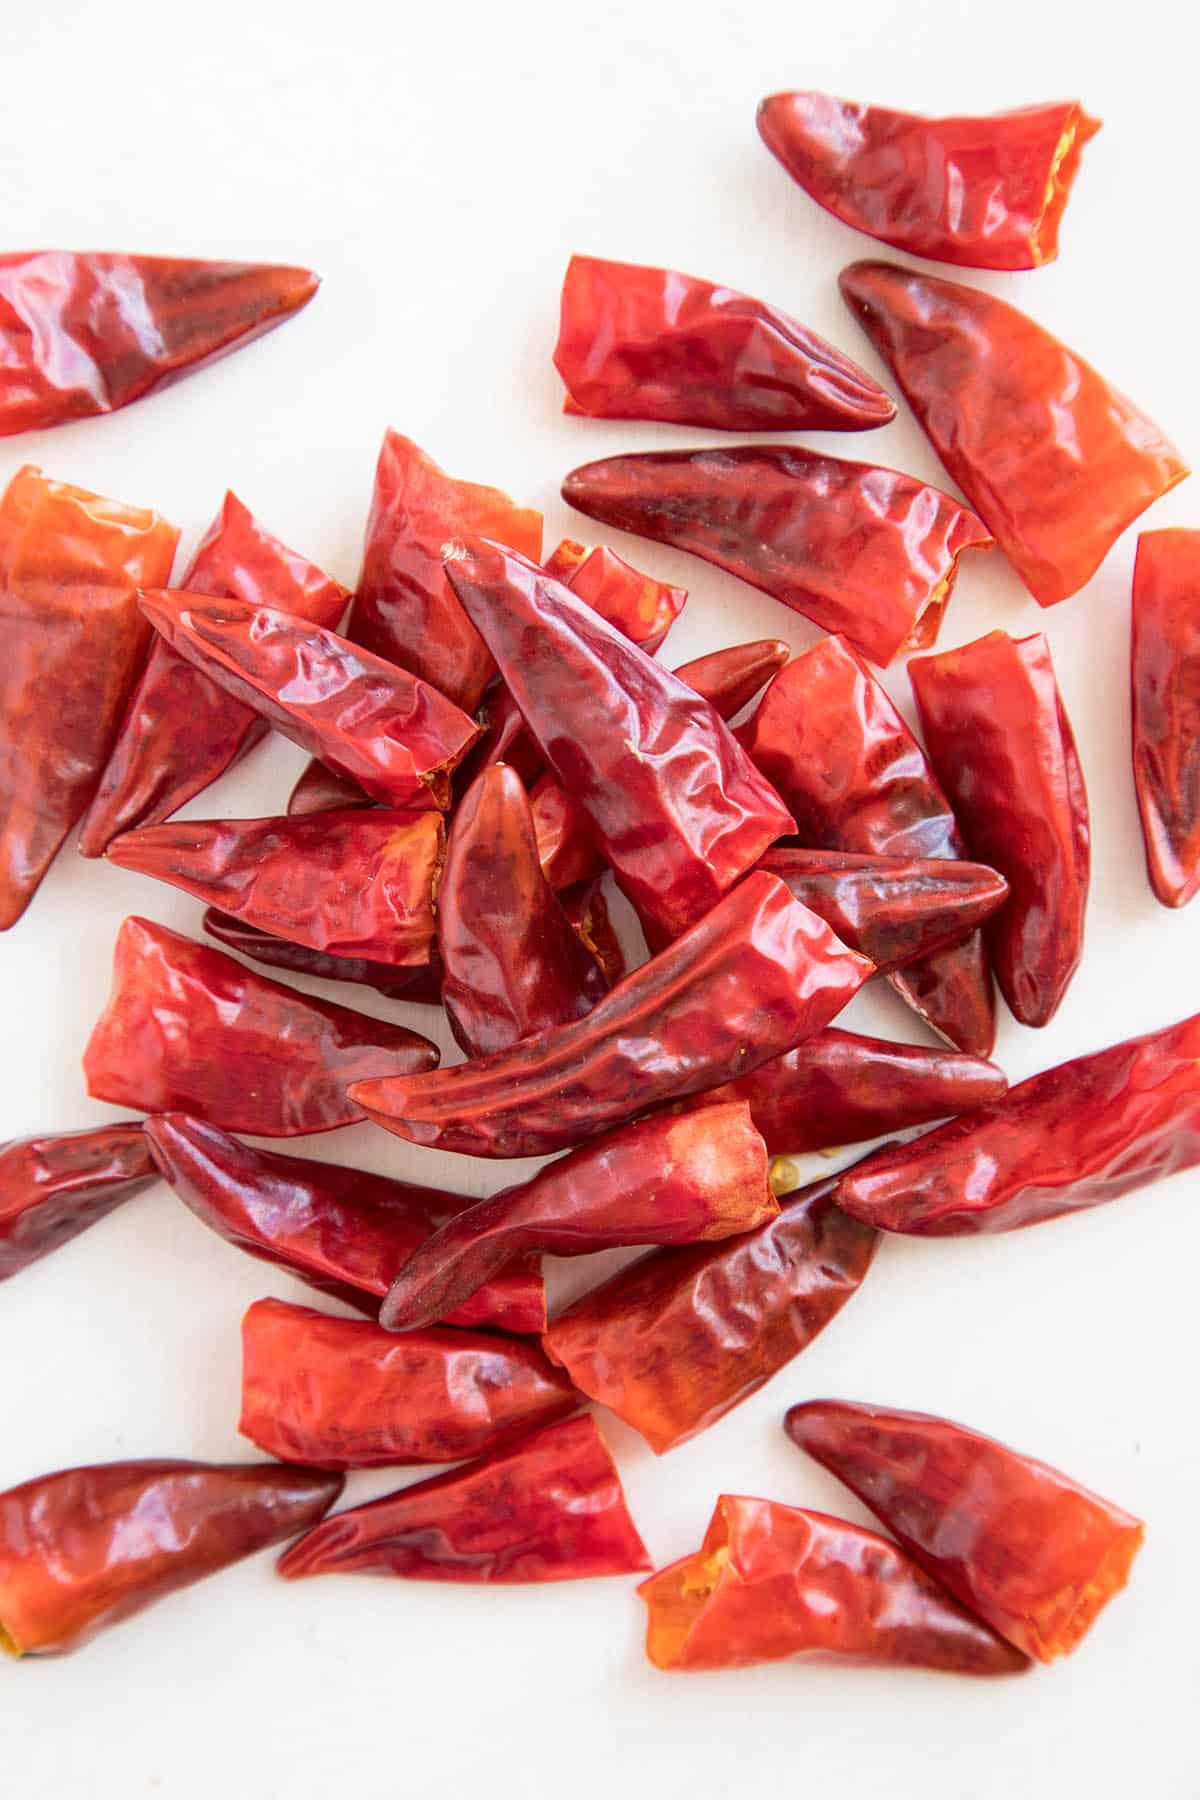 Hawaiian Sweet Hot Chili Peppers - Dried Pods